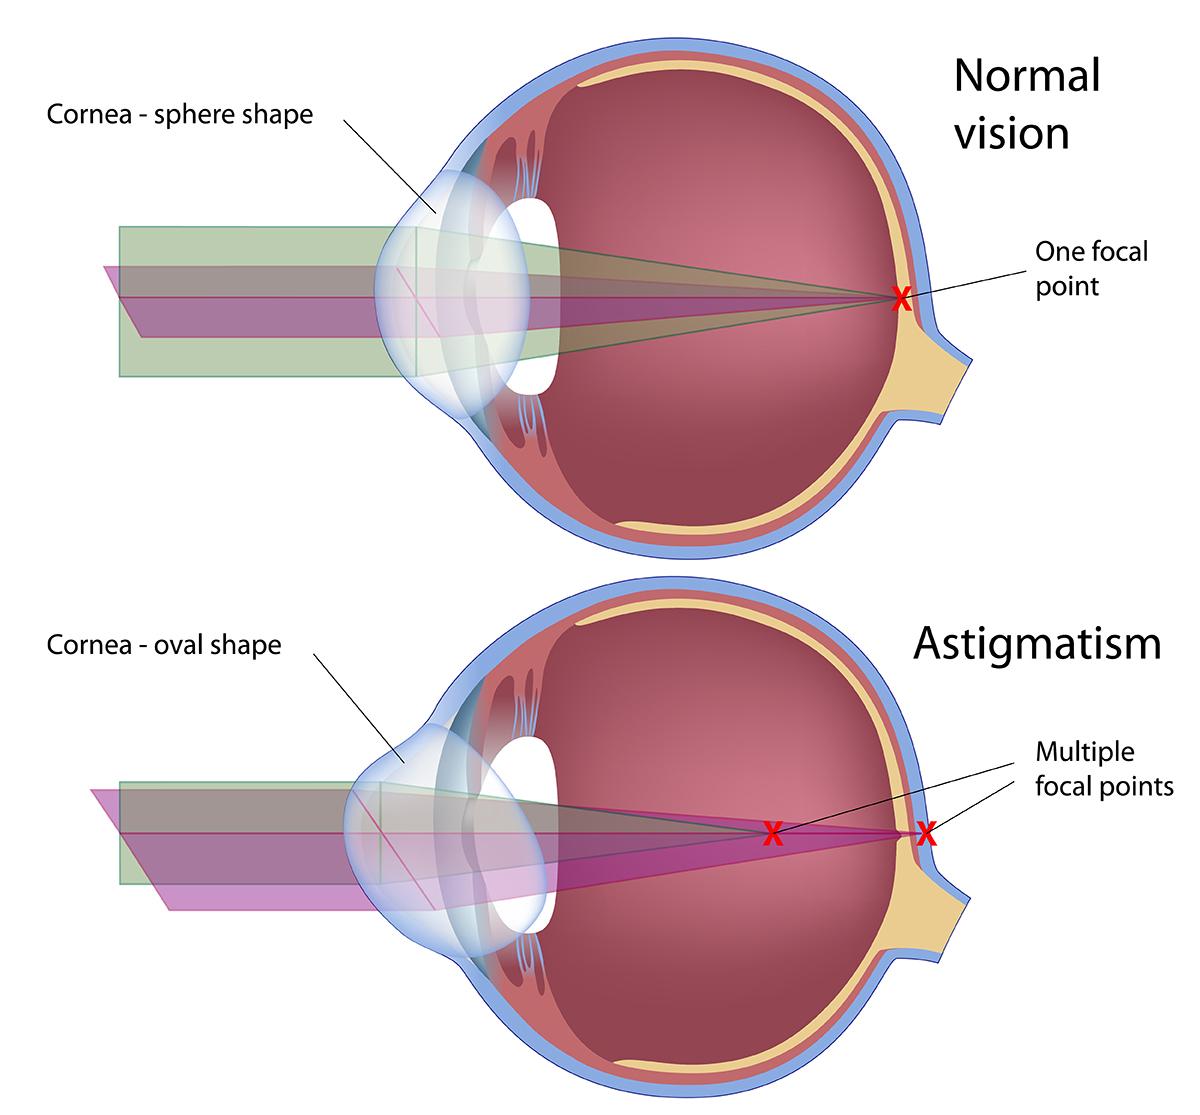 astigmatism example illustration